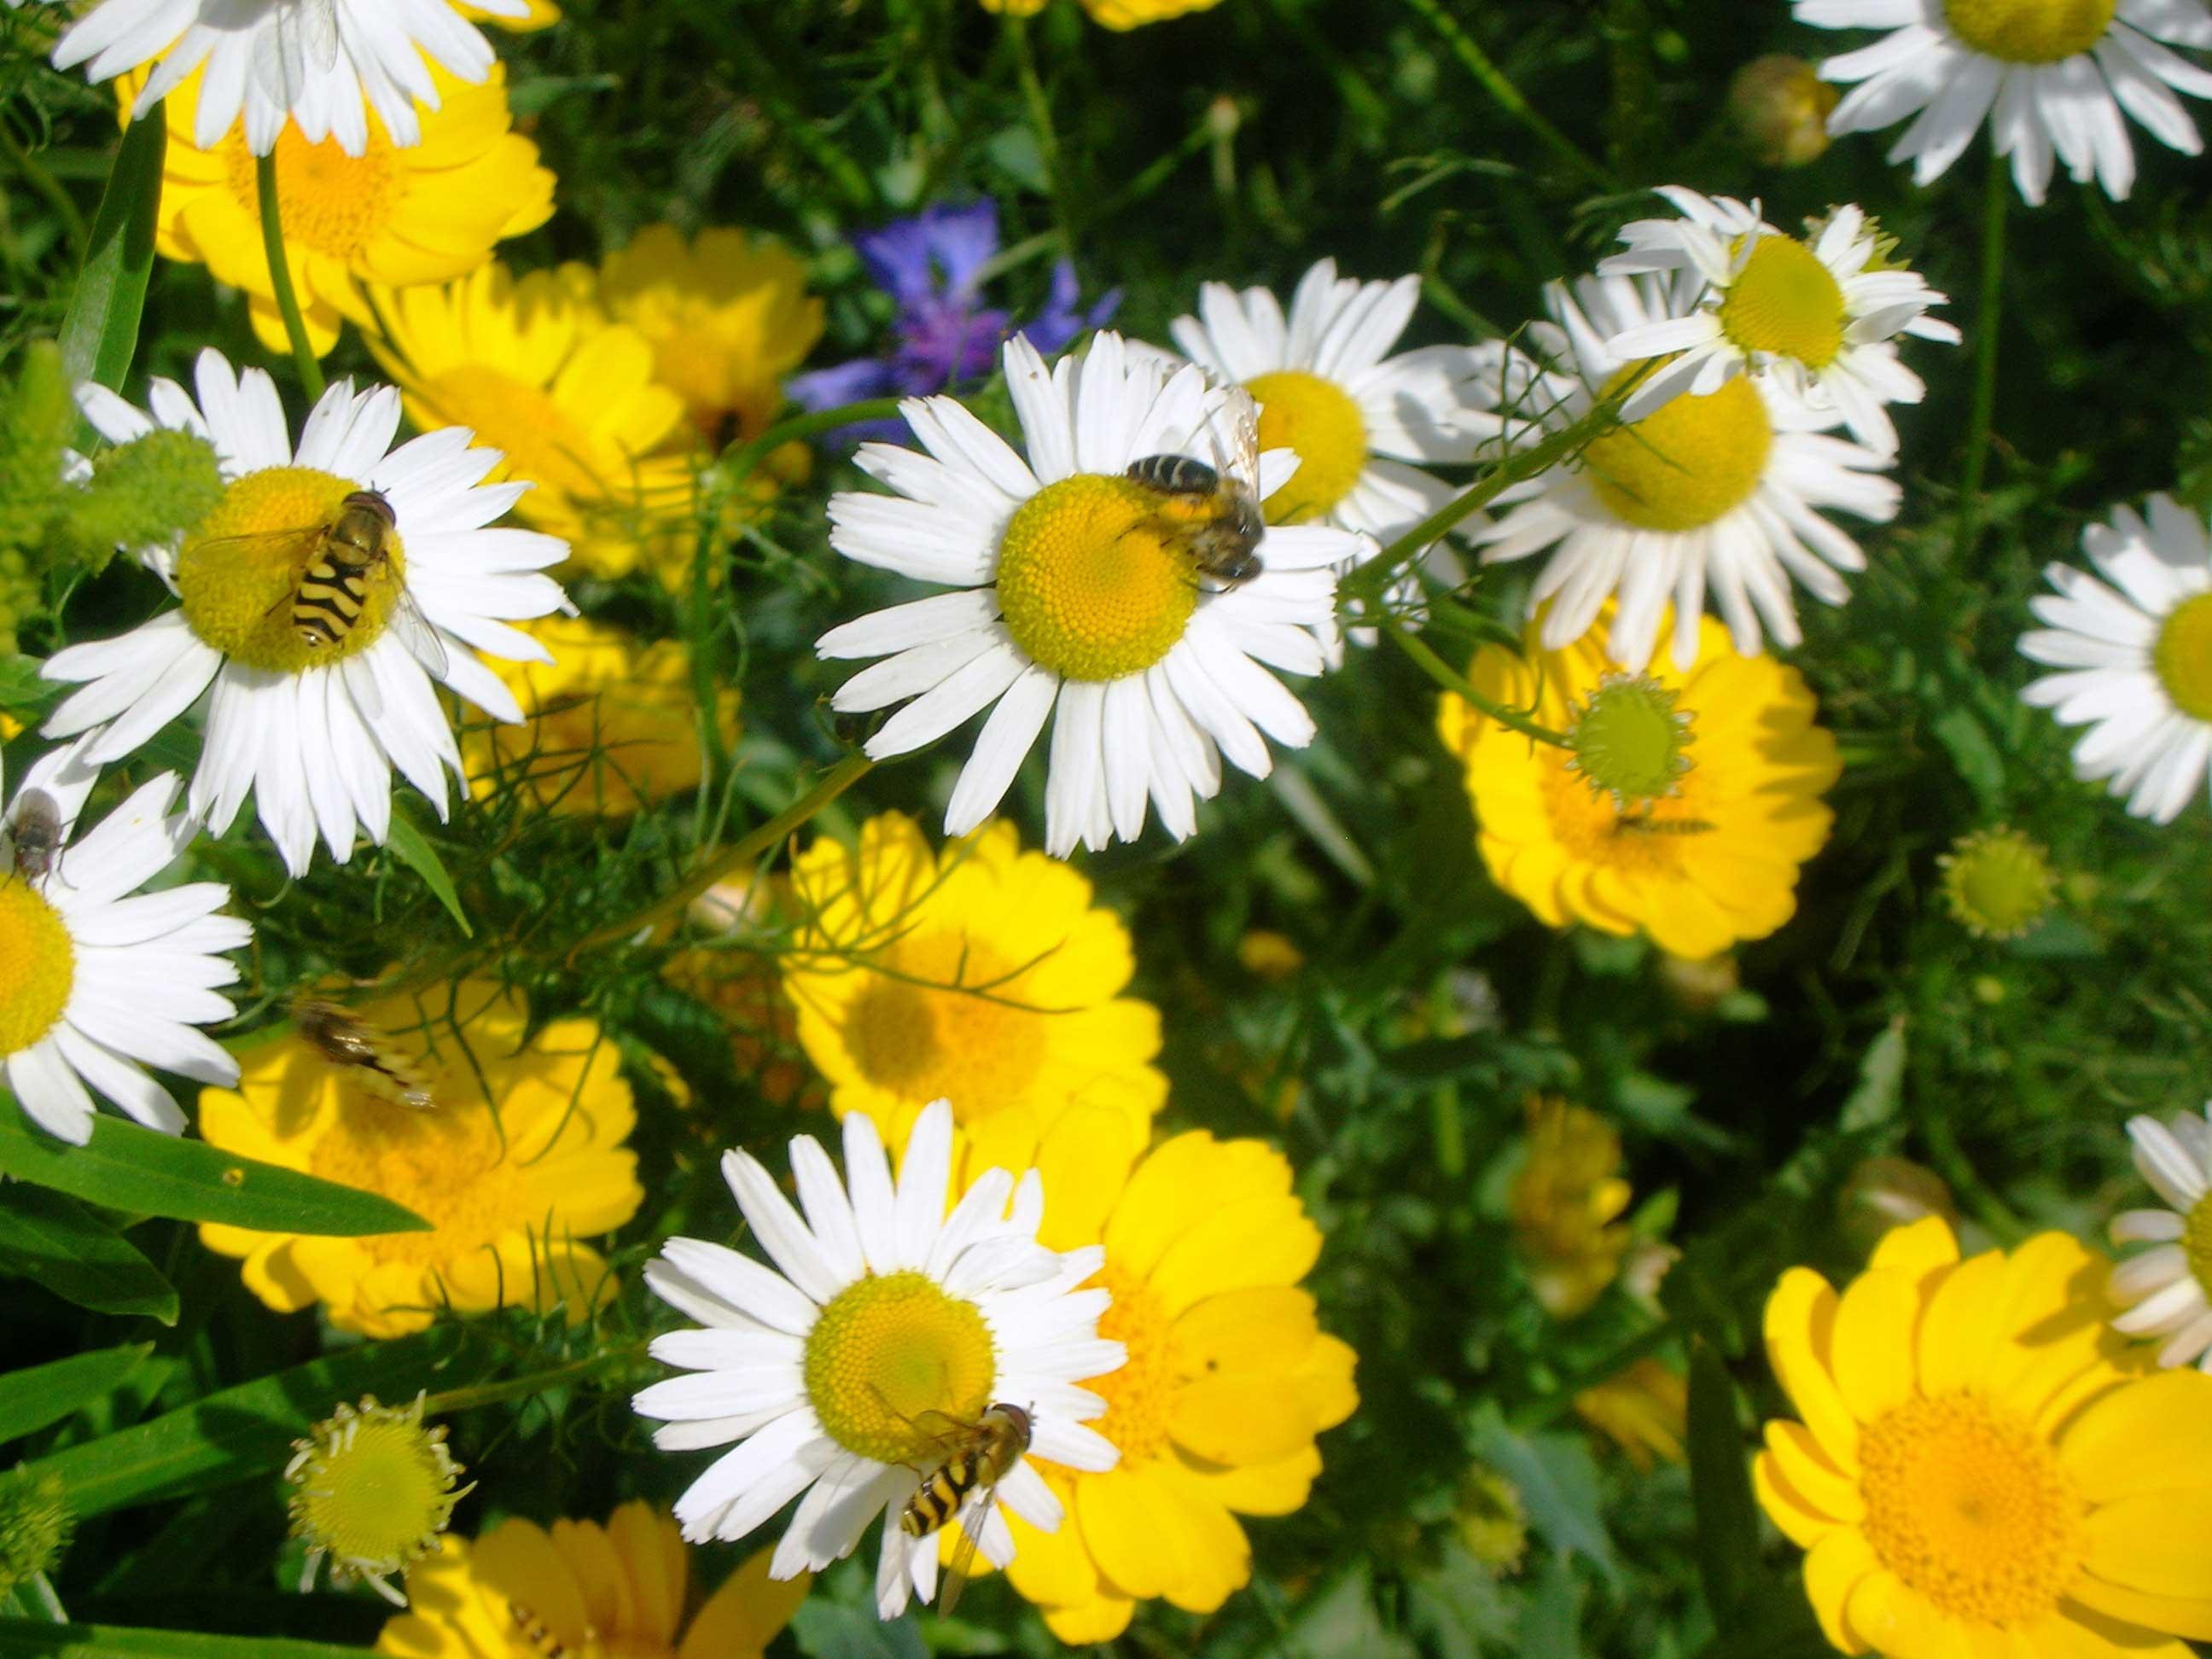 Pflanzen klemp gartengestaltung for Gartengestaltung pflanzen